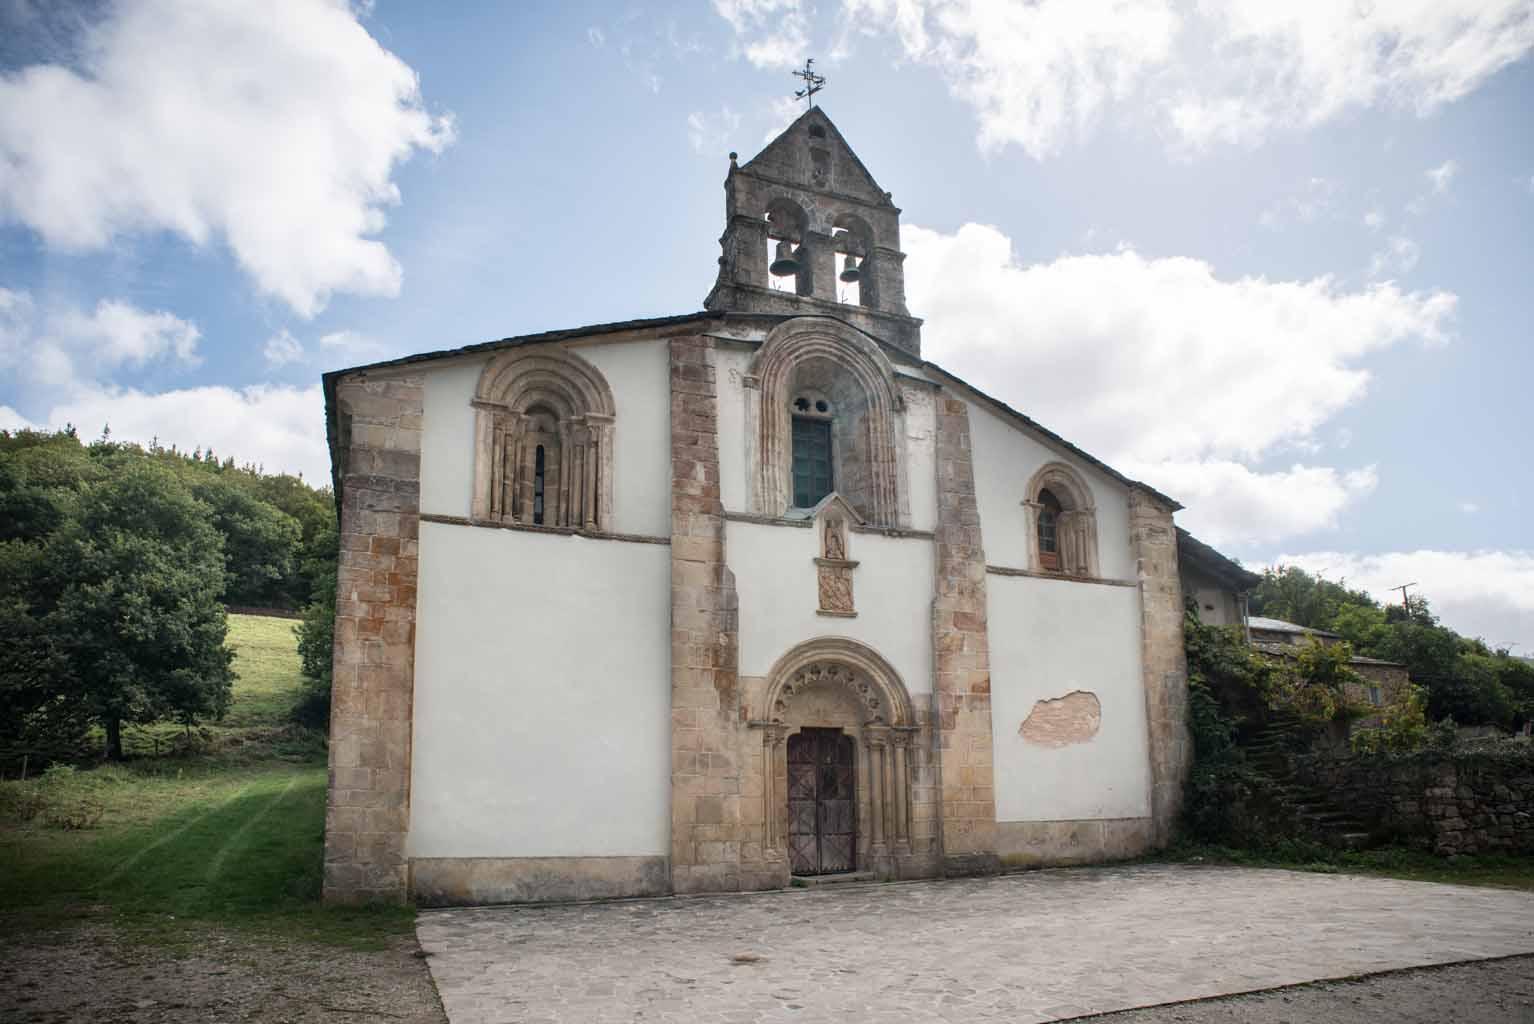 Monasterio Sta. Maria de Penamaior